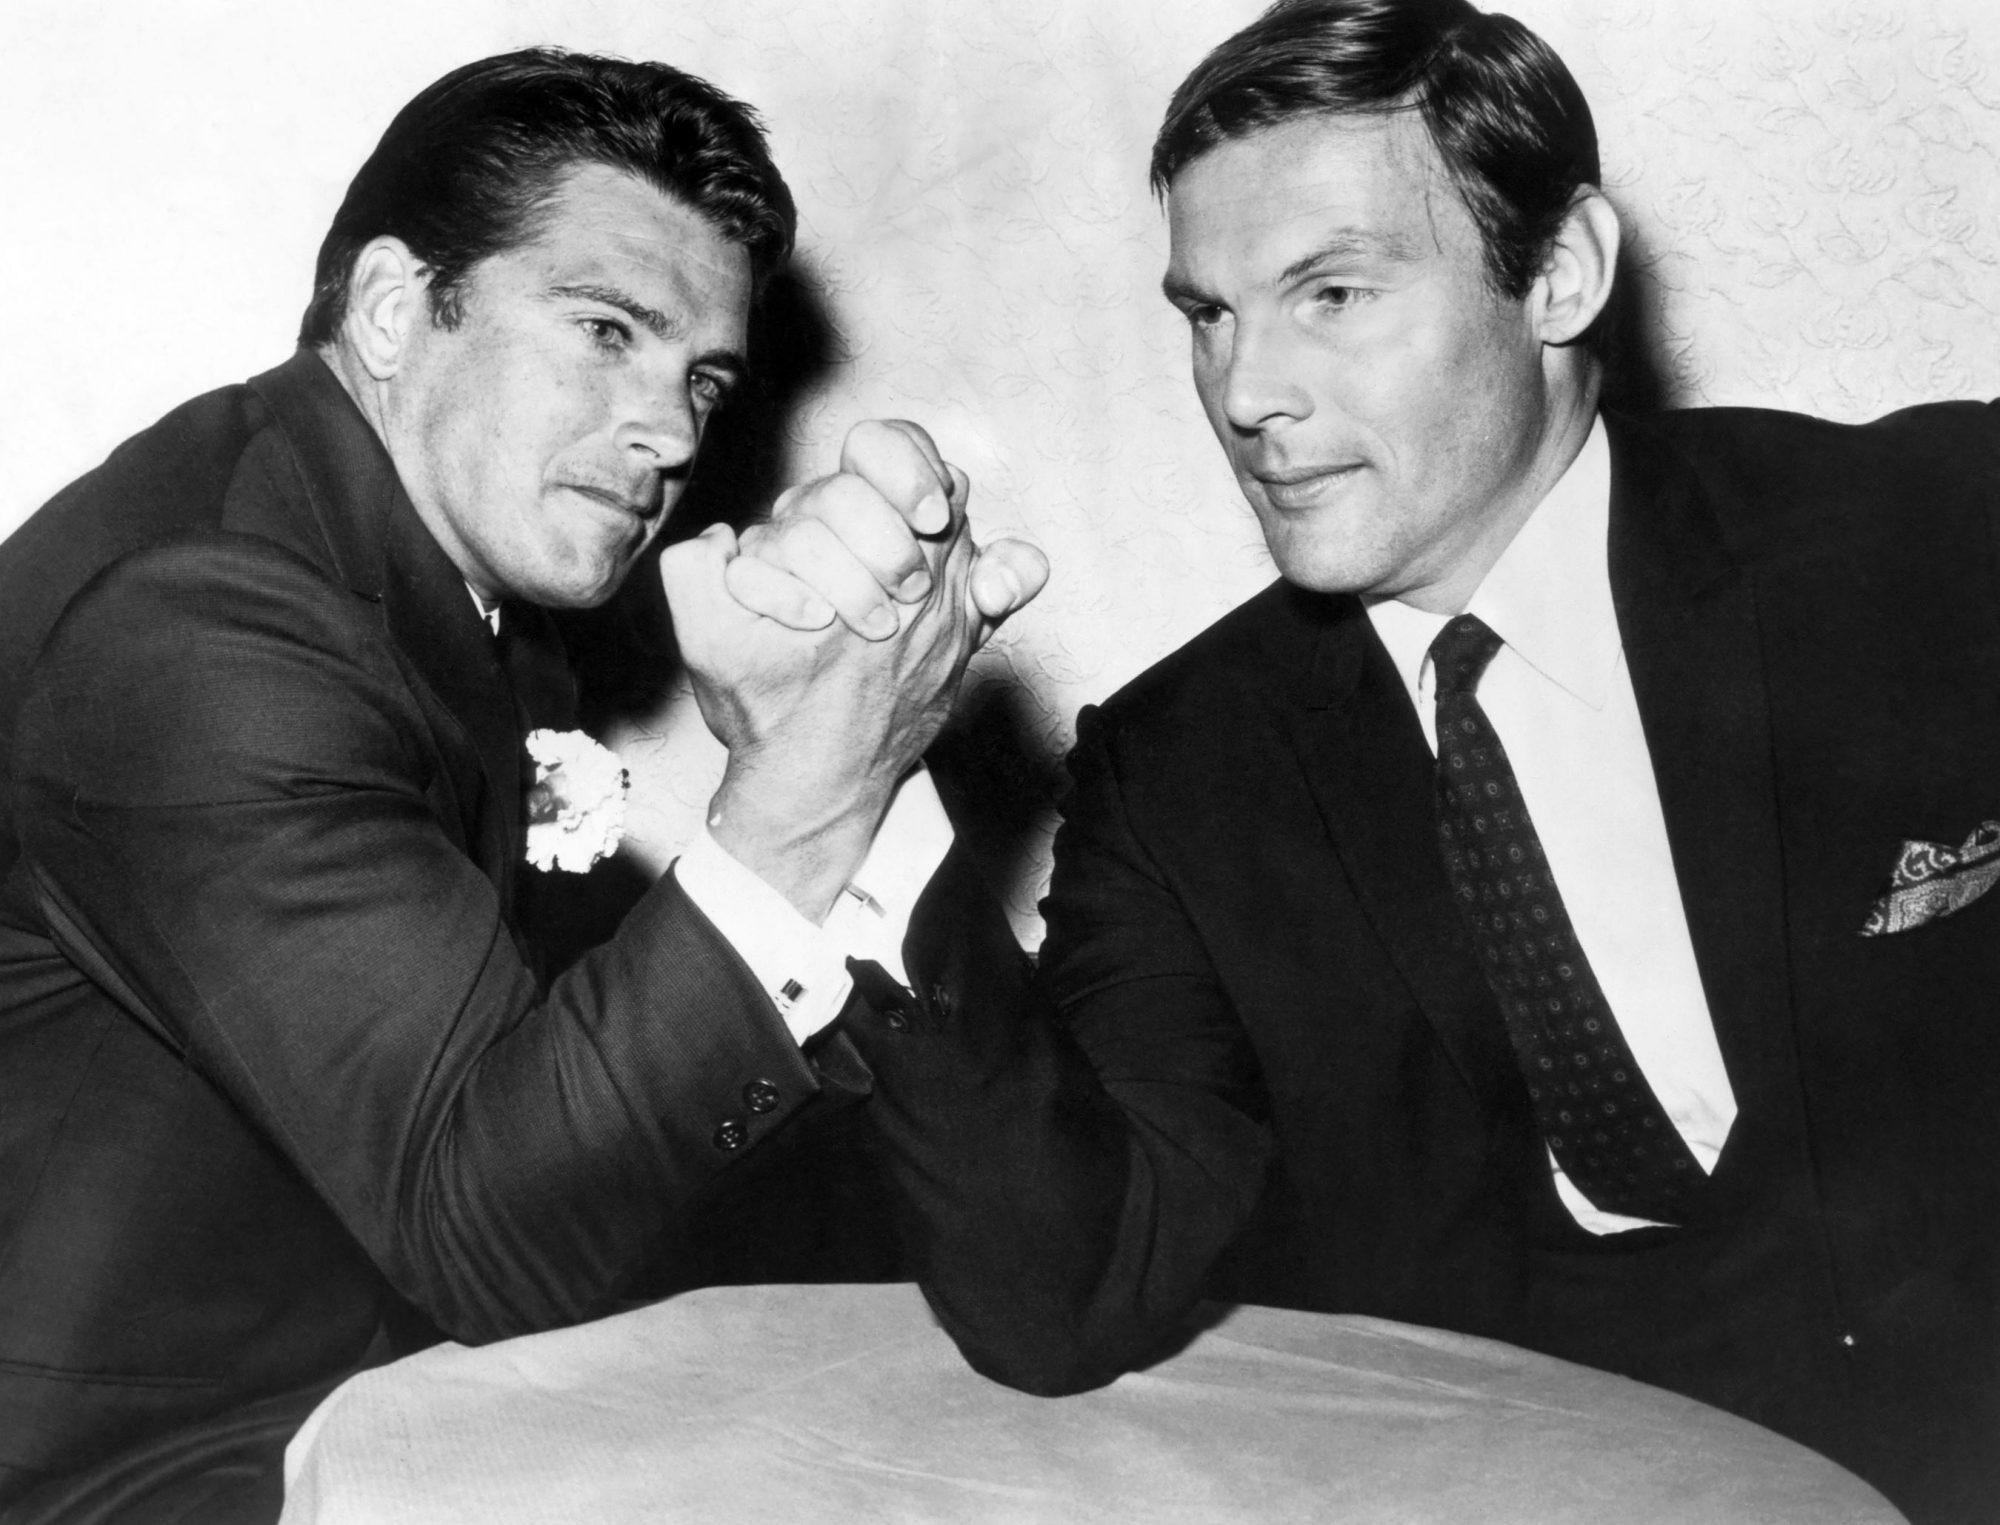 GREEN HORNET, Van Williams, Adam West in a ABC publicity shot (1967), 1966-67